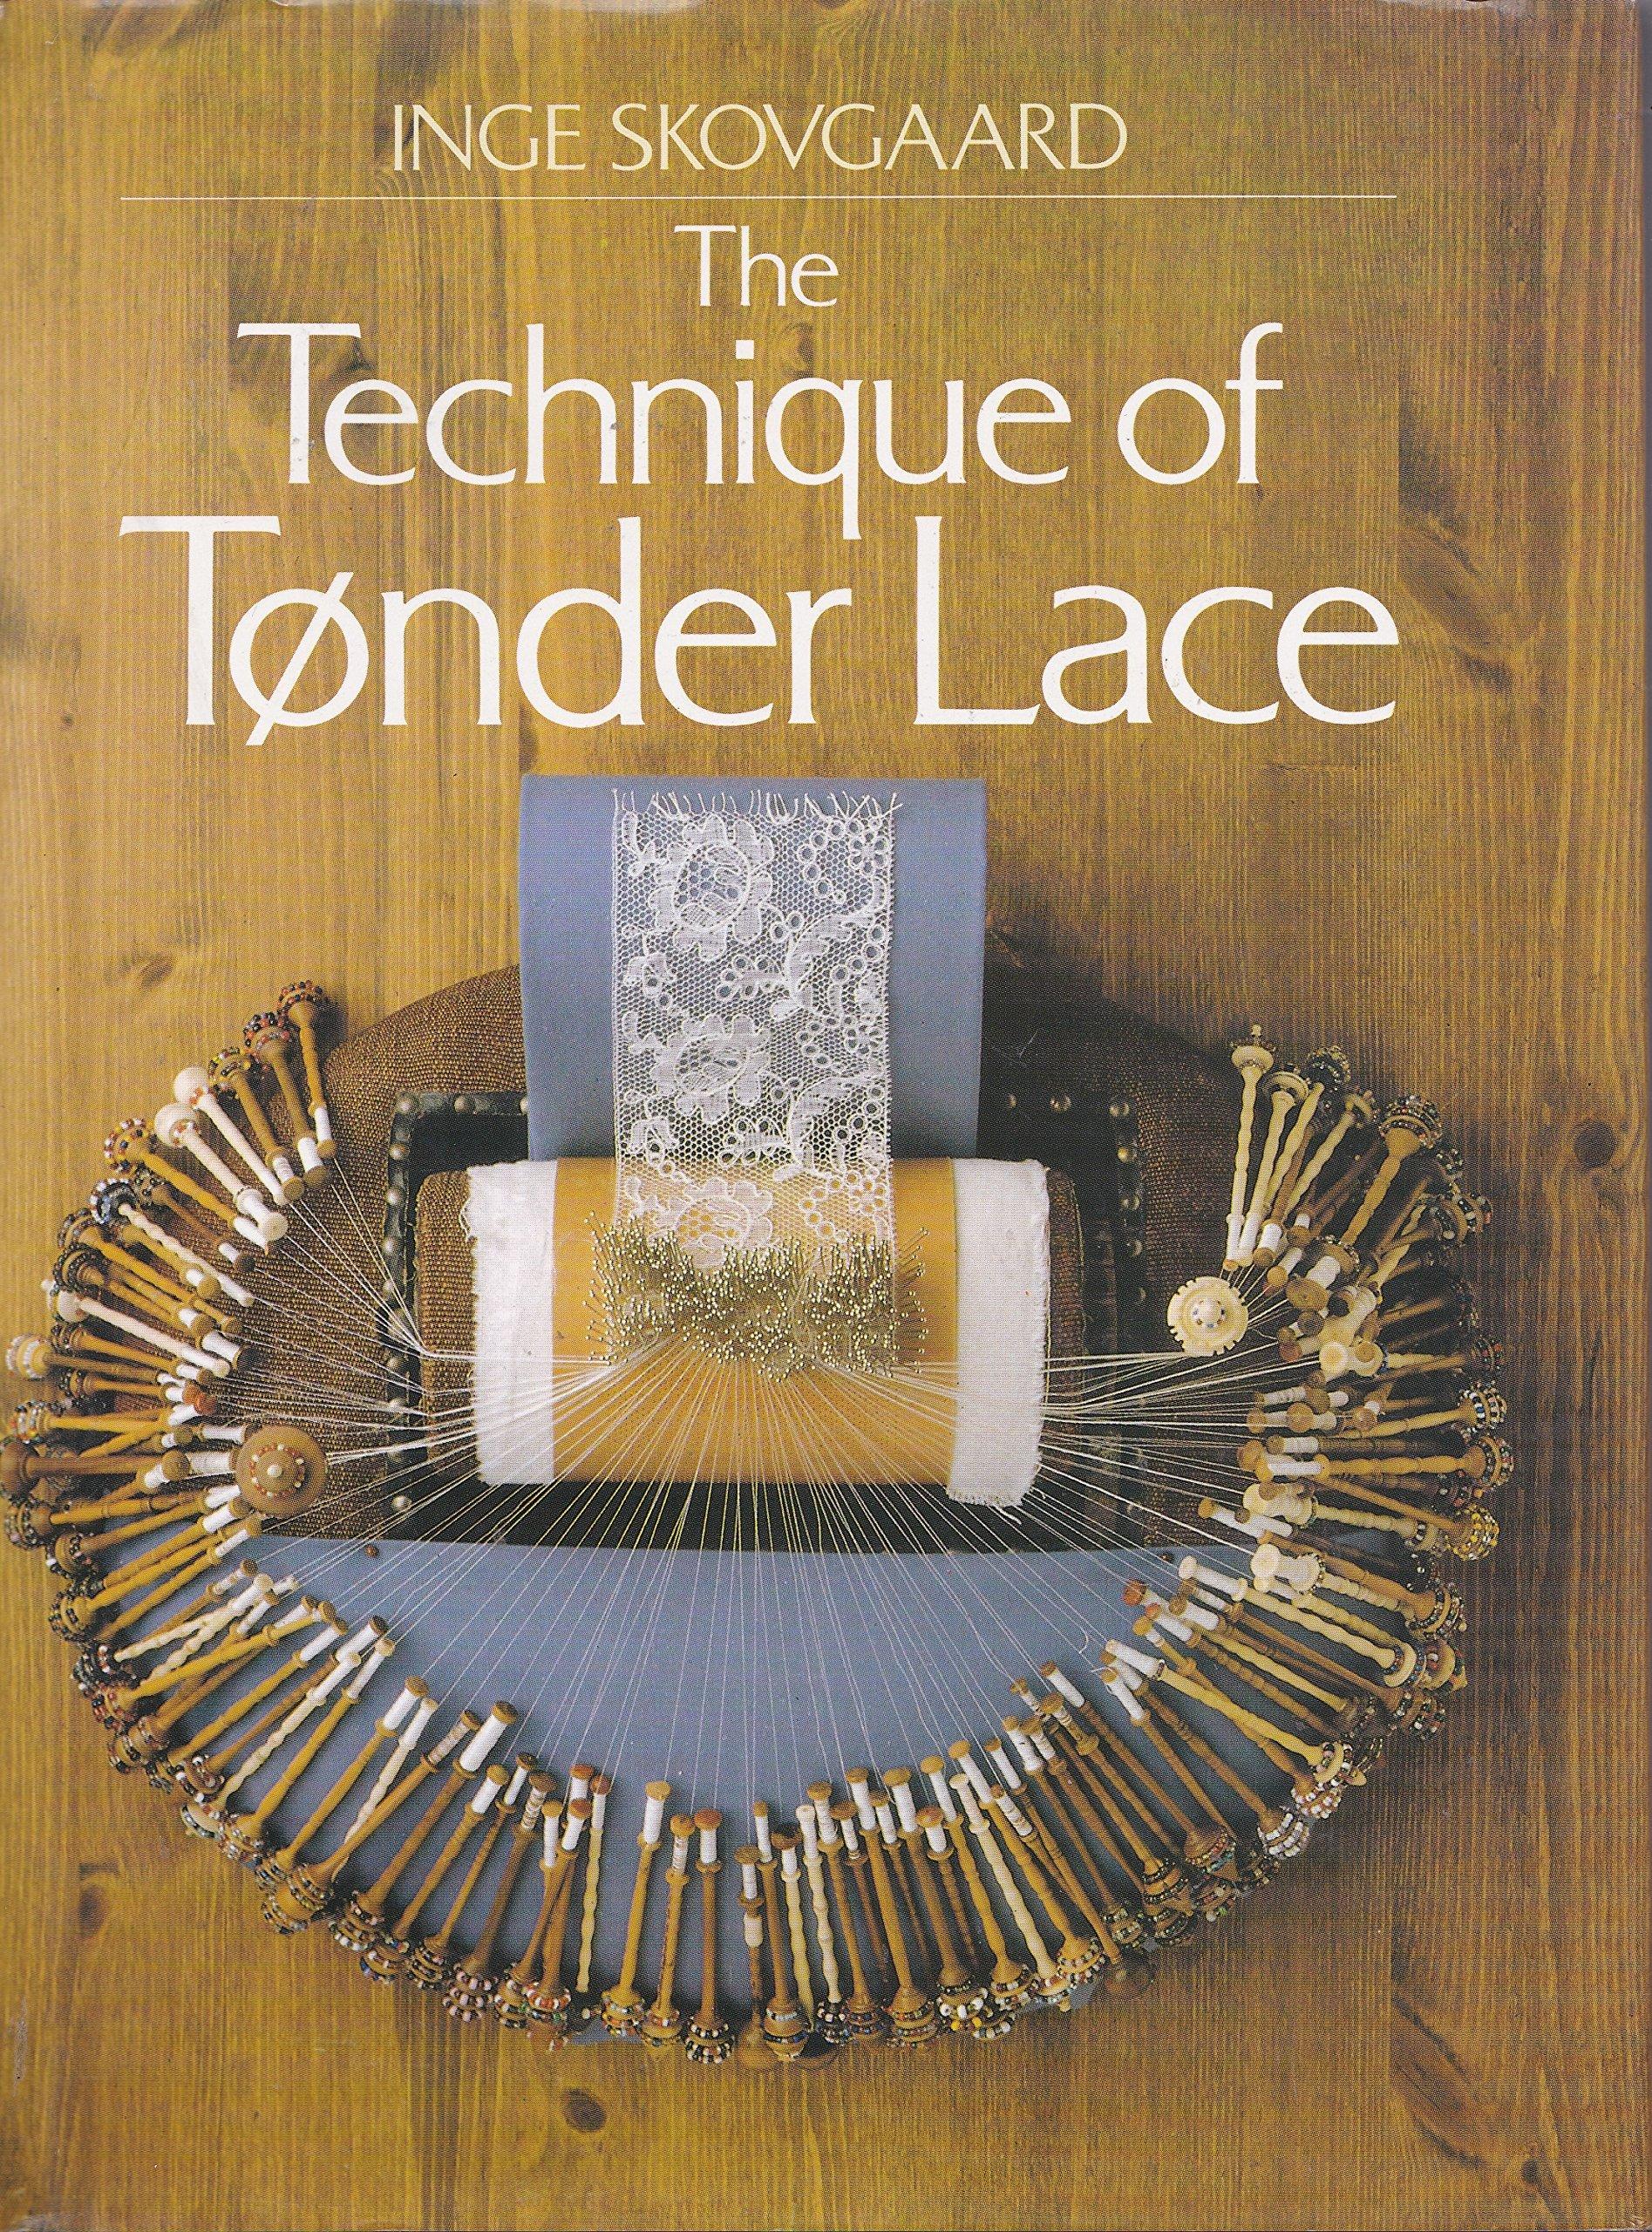 The Technique of Tonder Lace